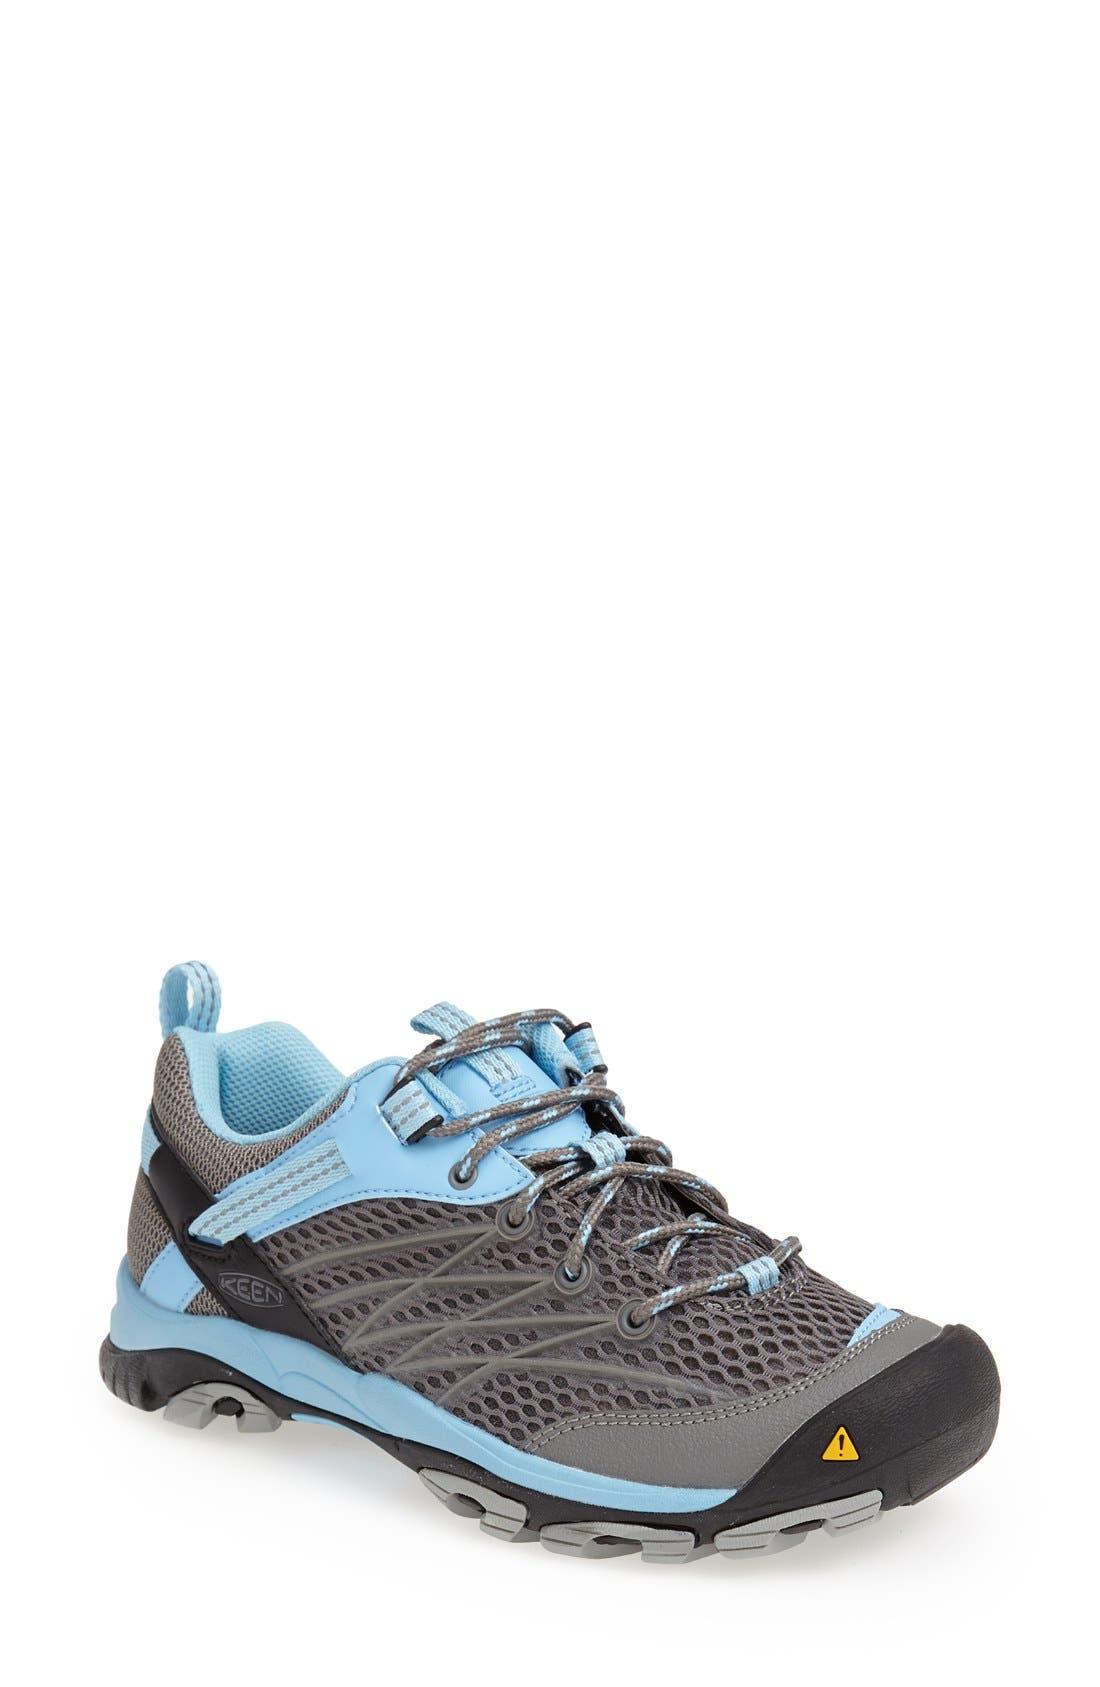 'Marshall' Hiking Shoe,                             Main thumbnail 1, color,                             020